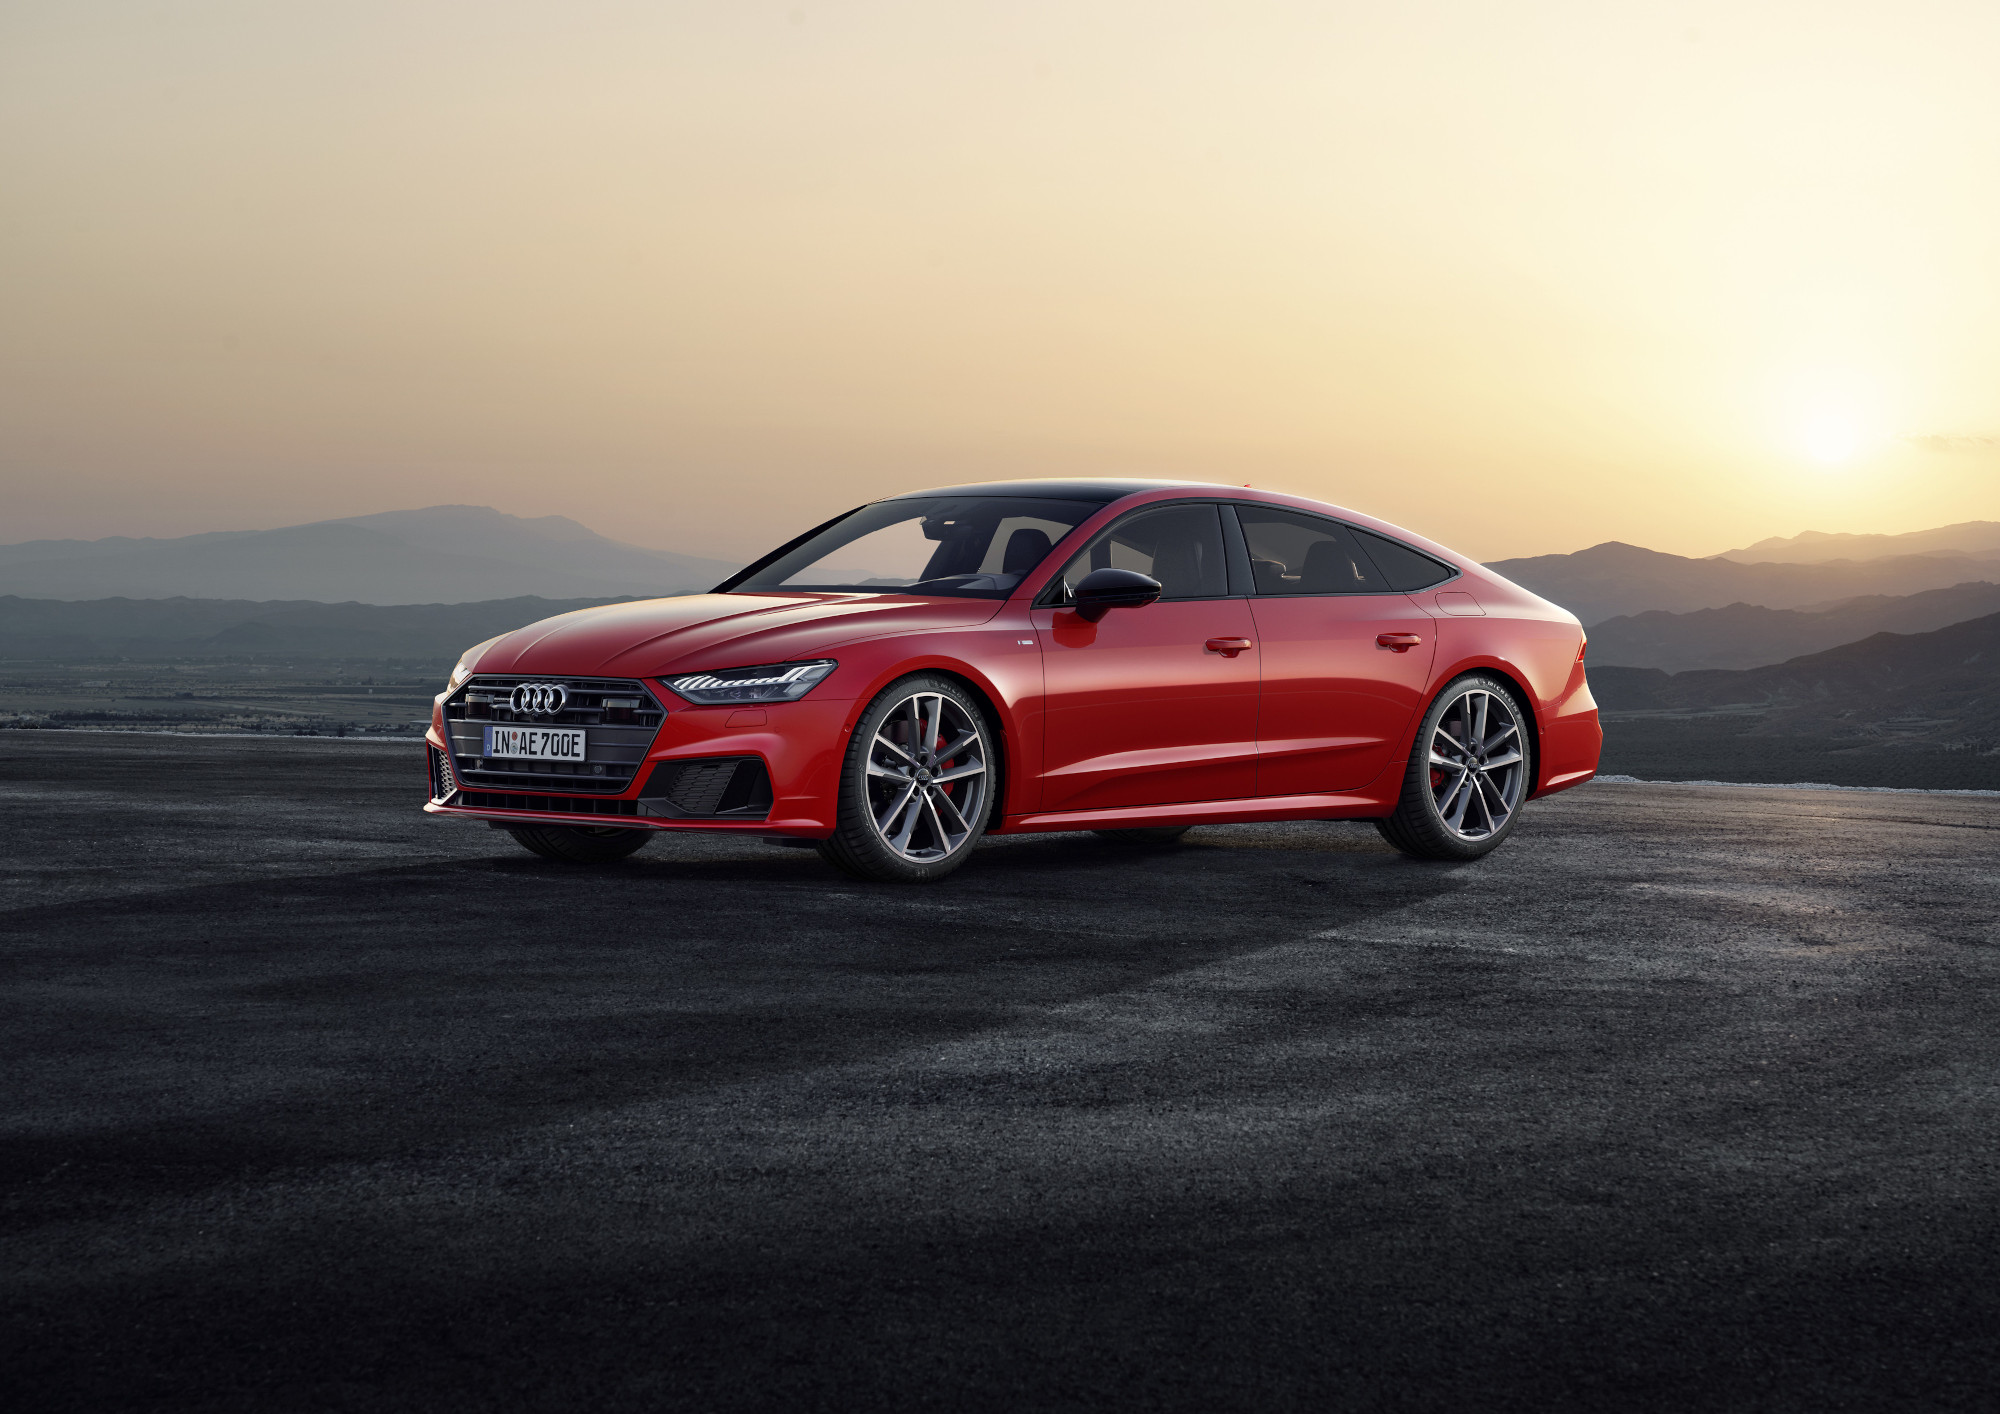 Actualizan los híbridos enchufables Audi Q5, A6 y A7 Sportback